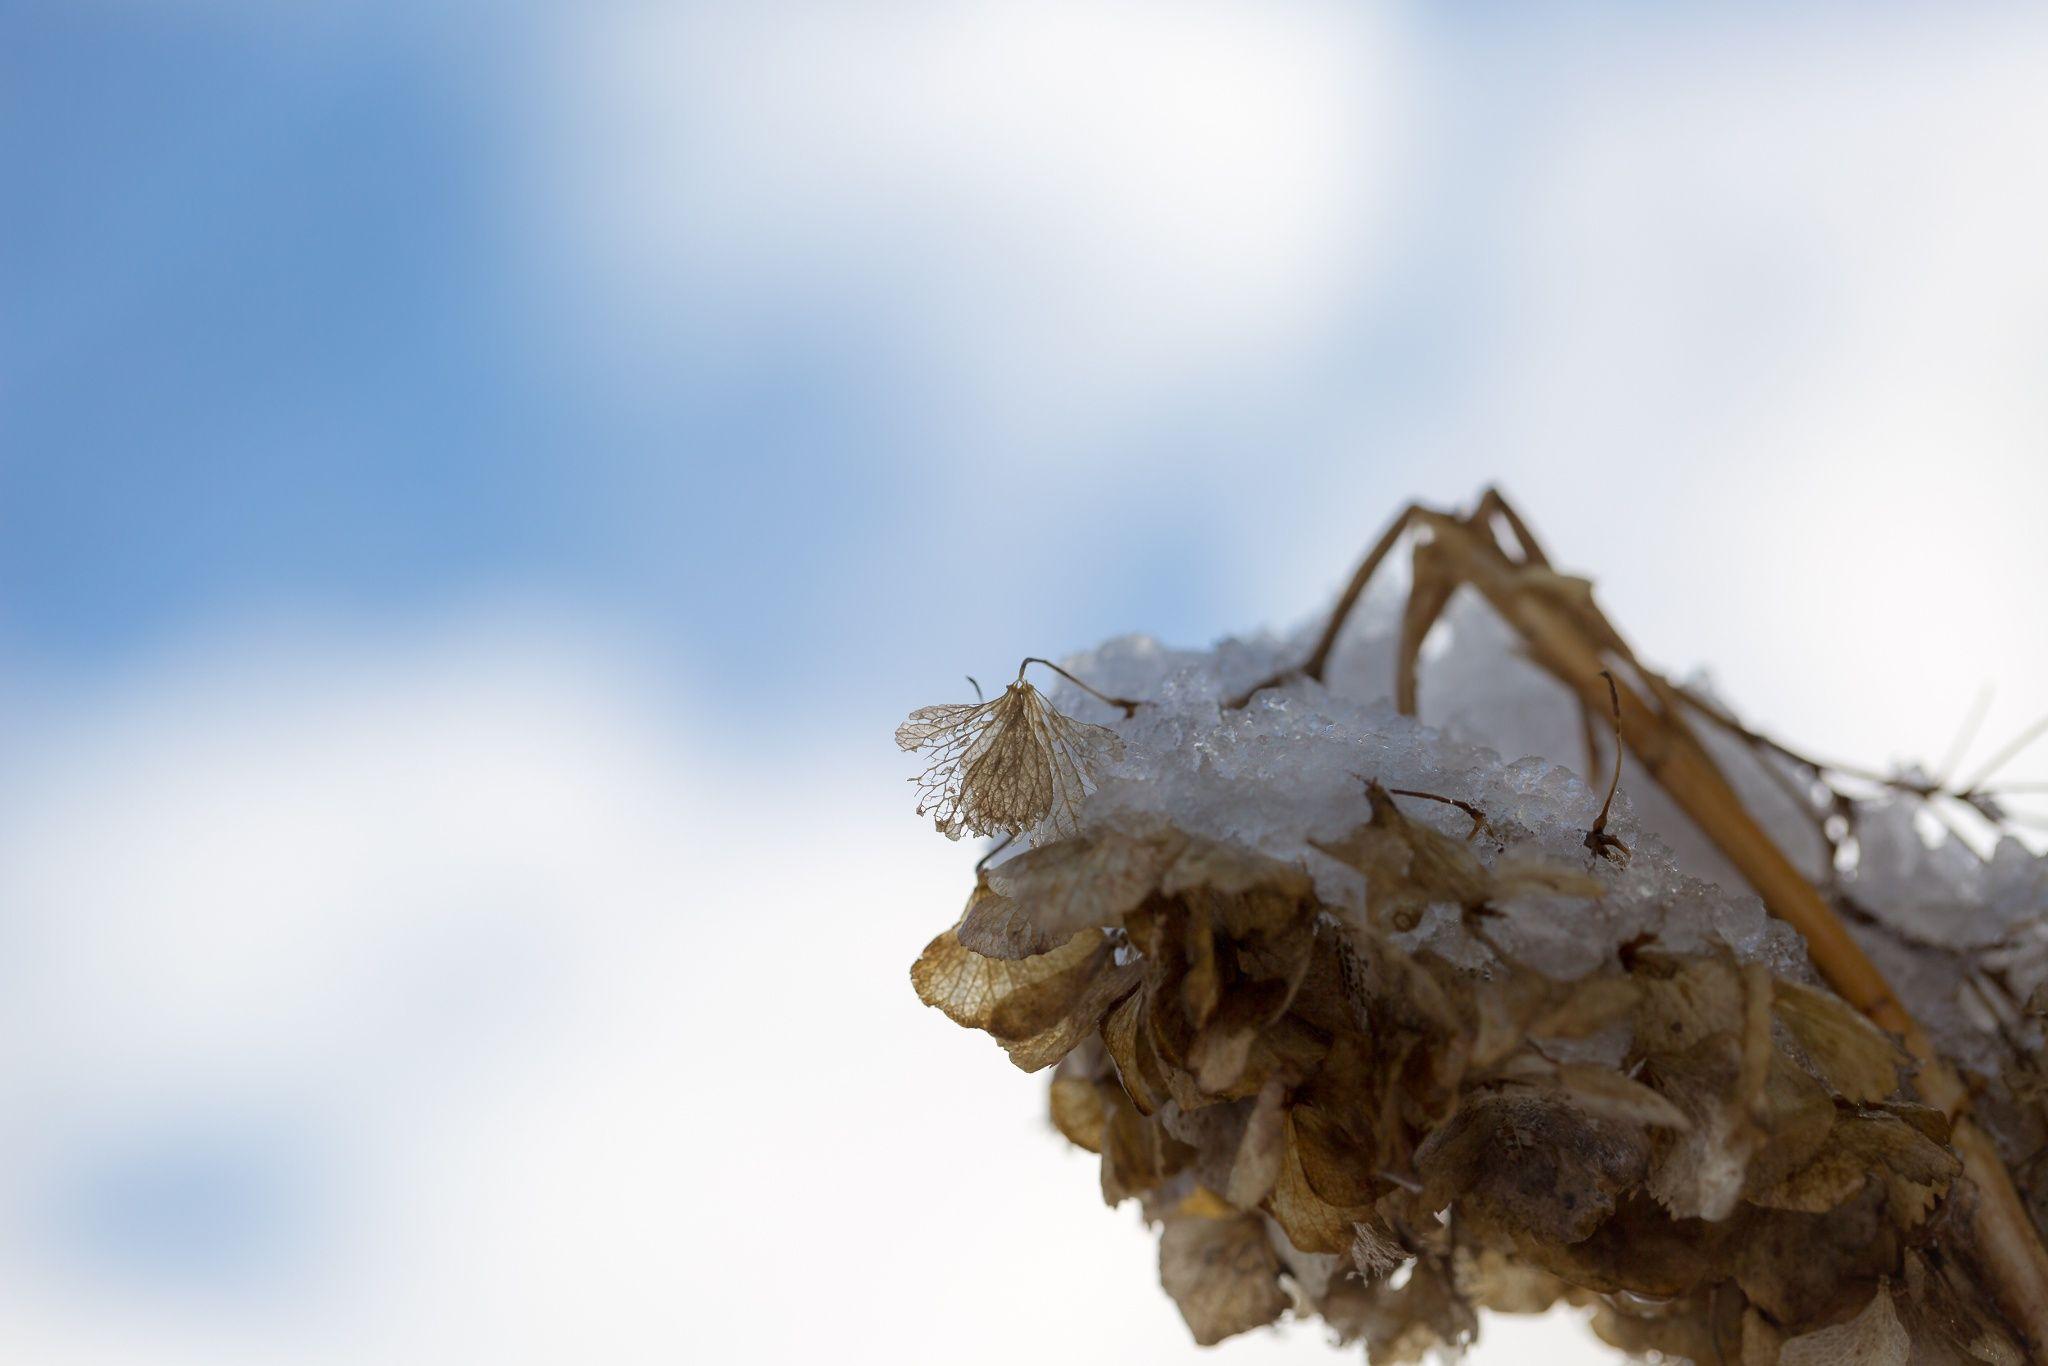 Winter hydrangea by Masaru Kuroda on 500px